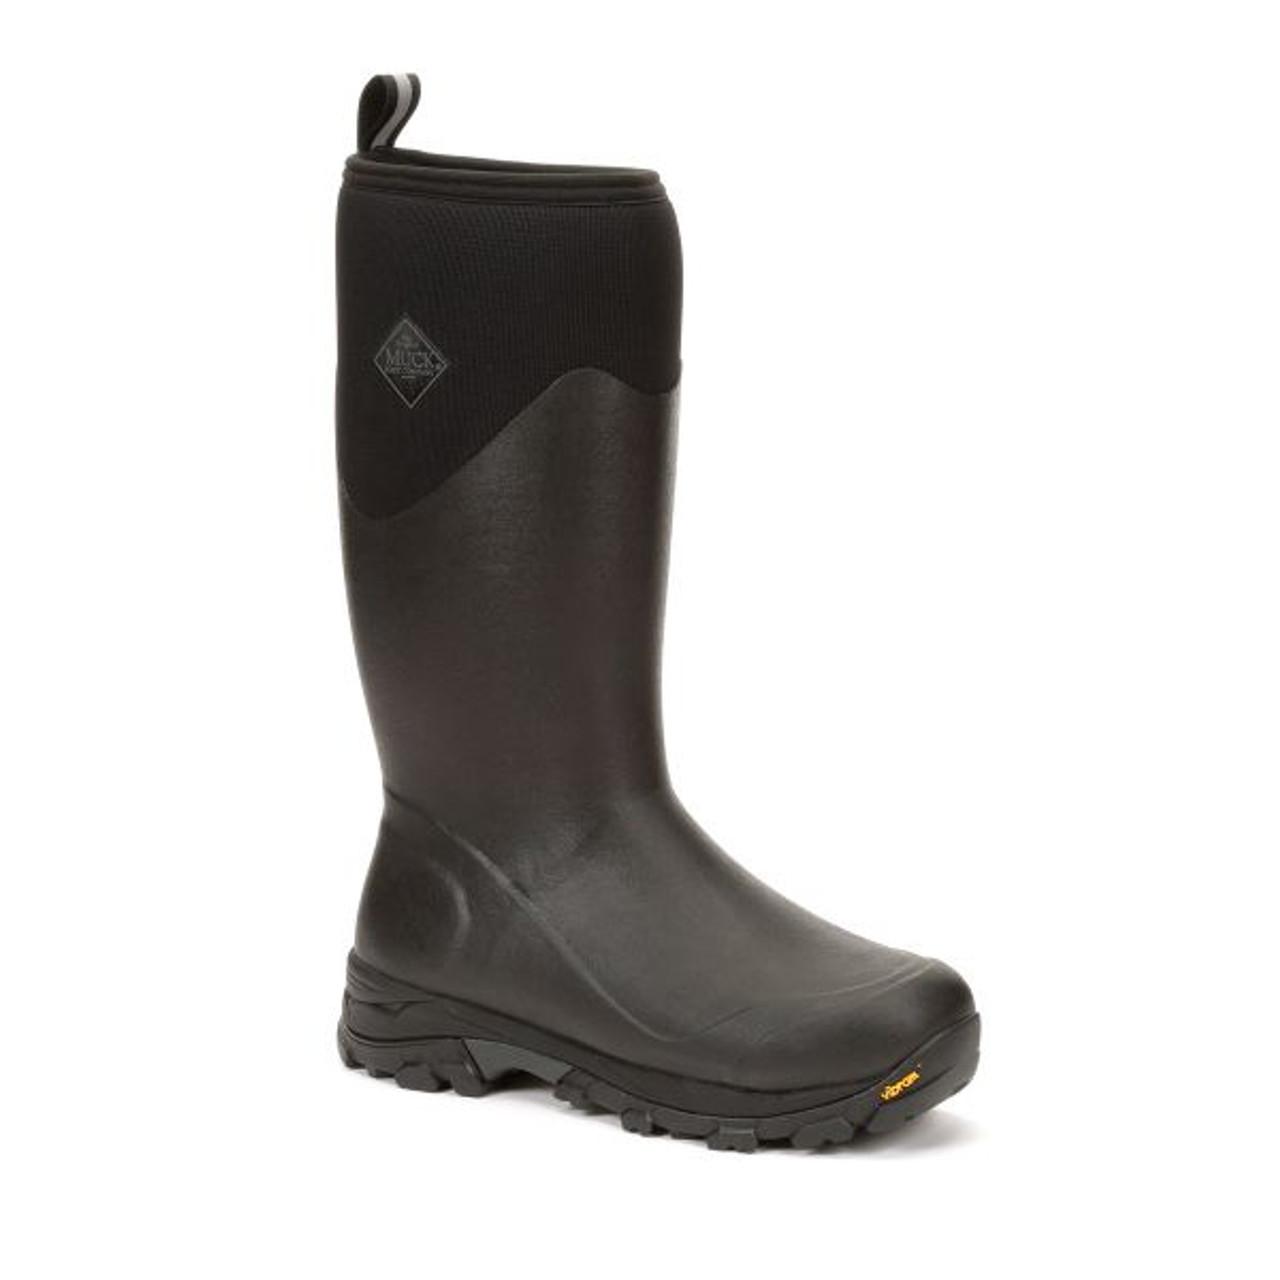 Men's Muck Arctic Ice Tall Winter Boot